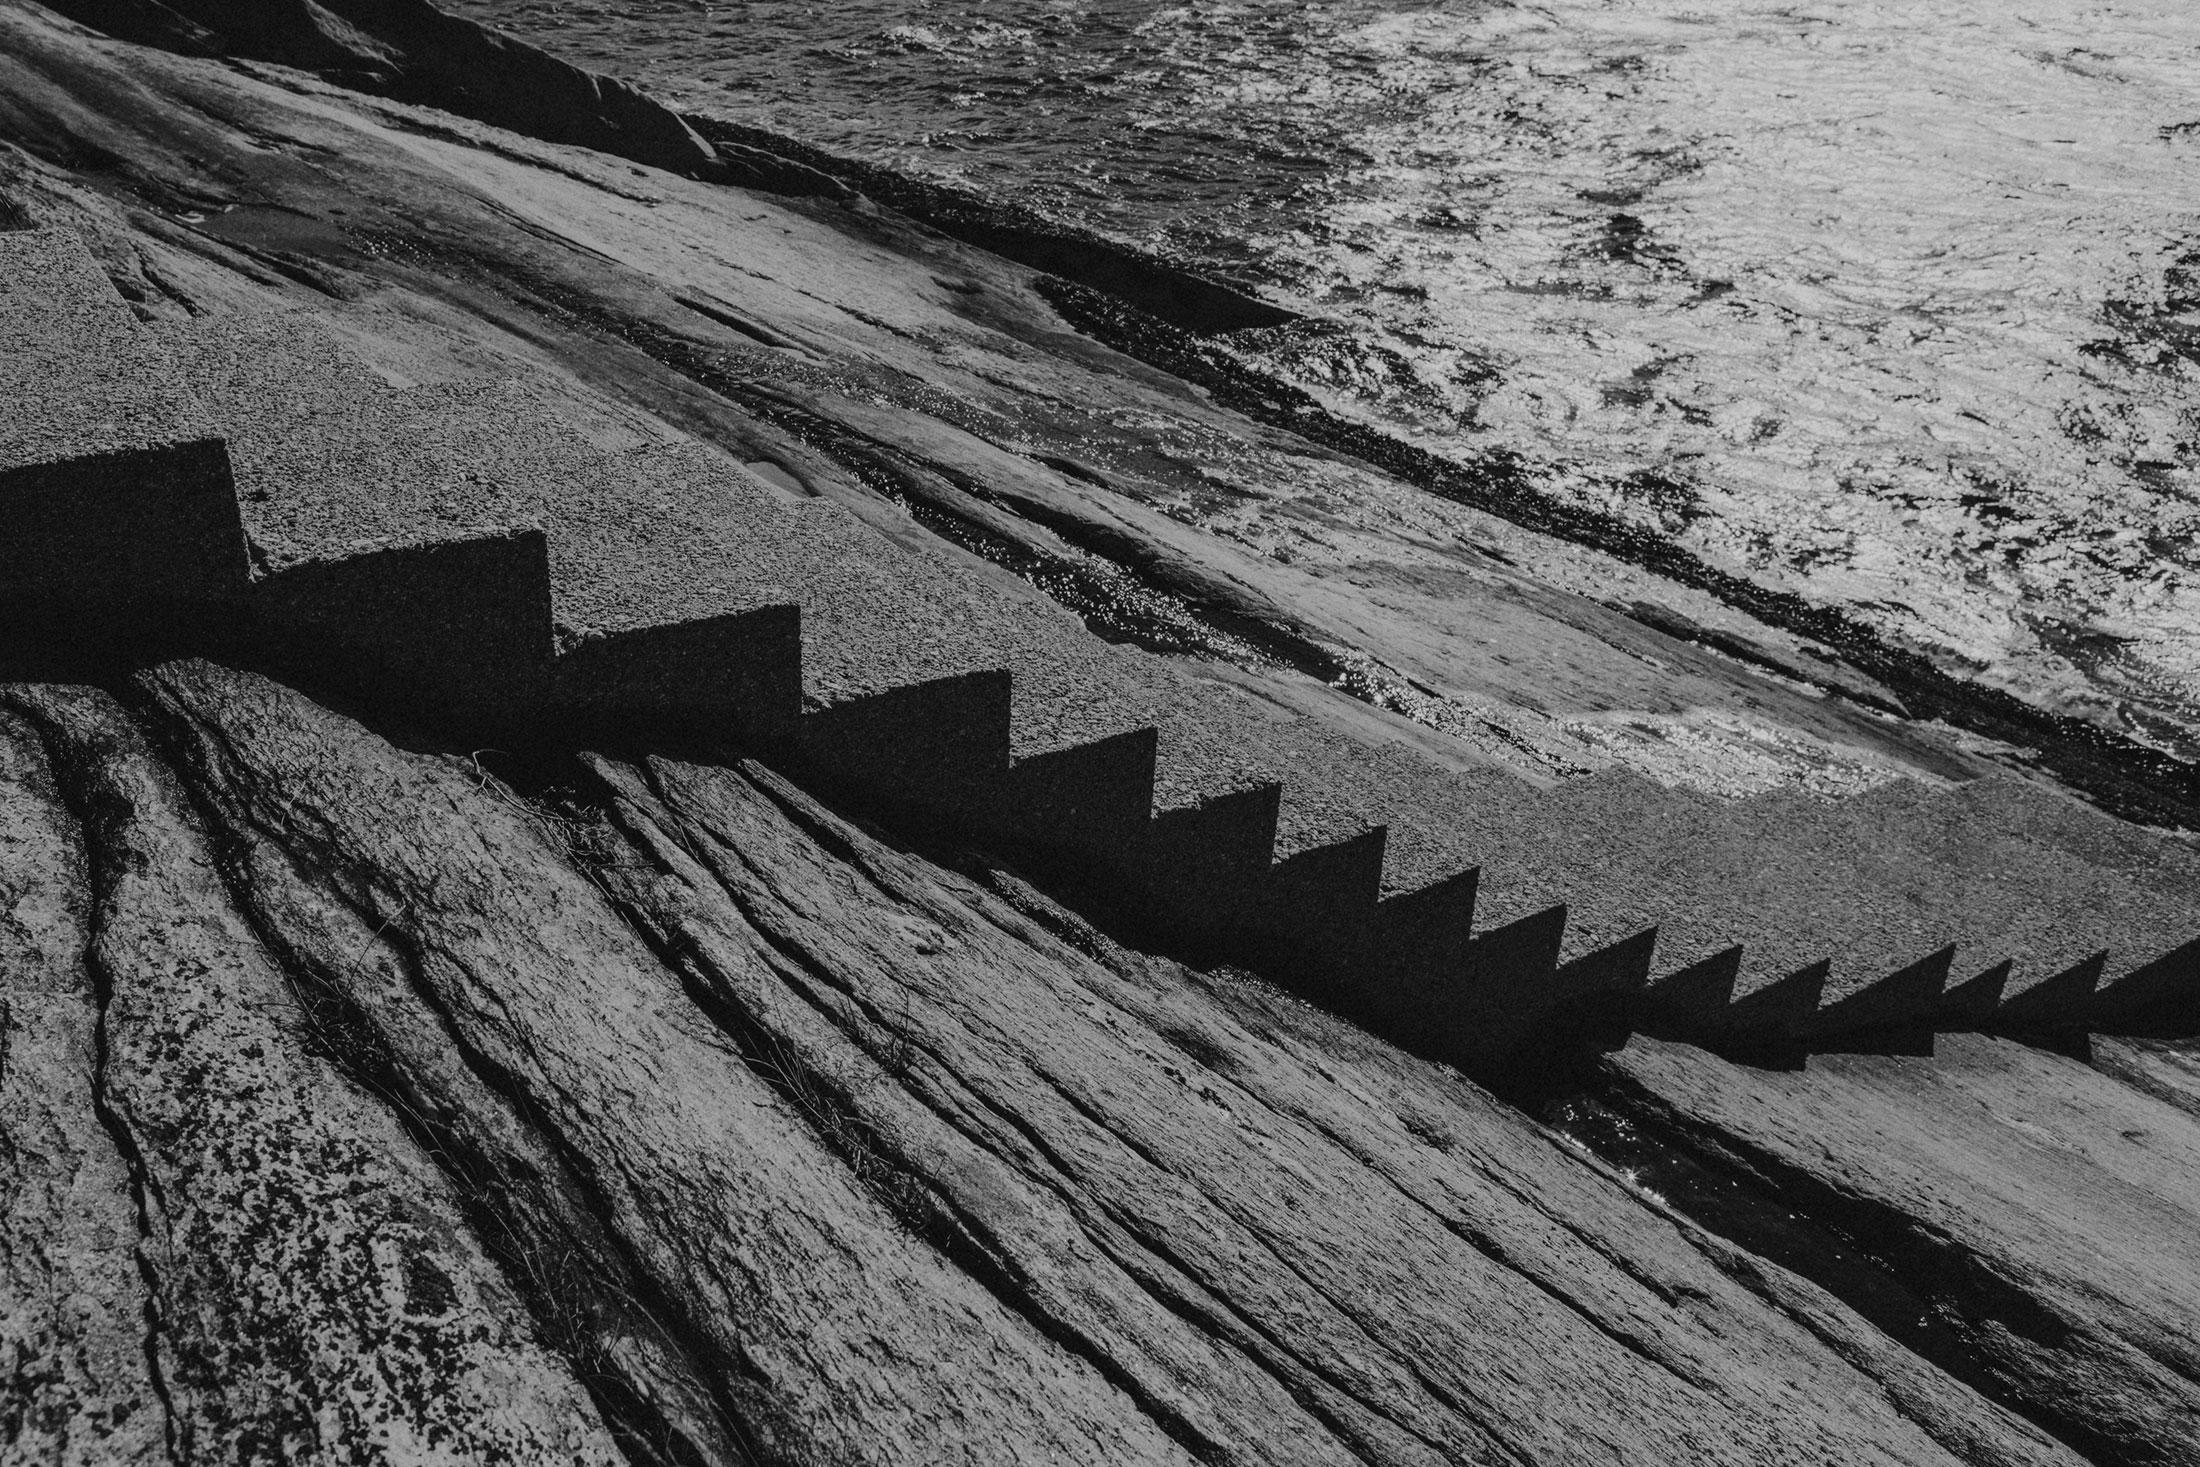 Helgelandskysten: Hellåga